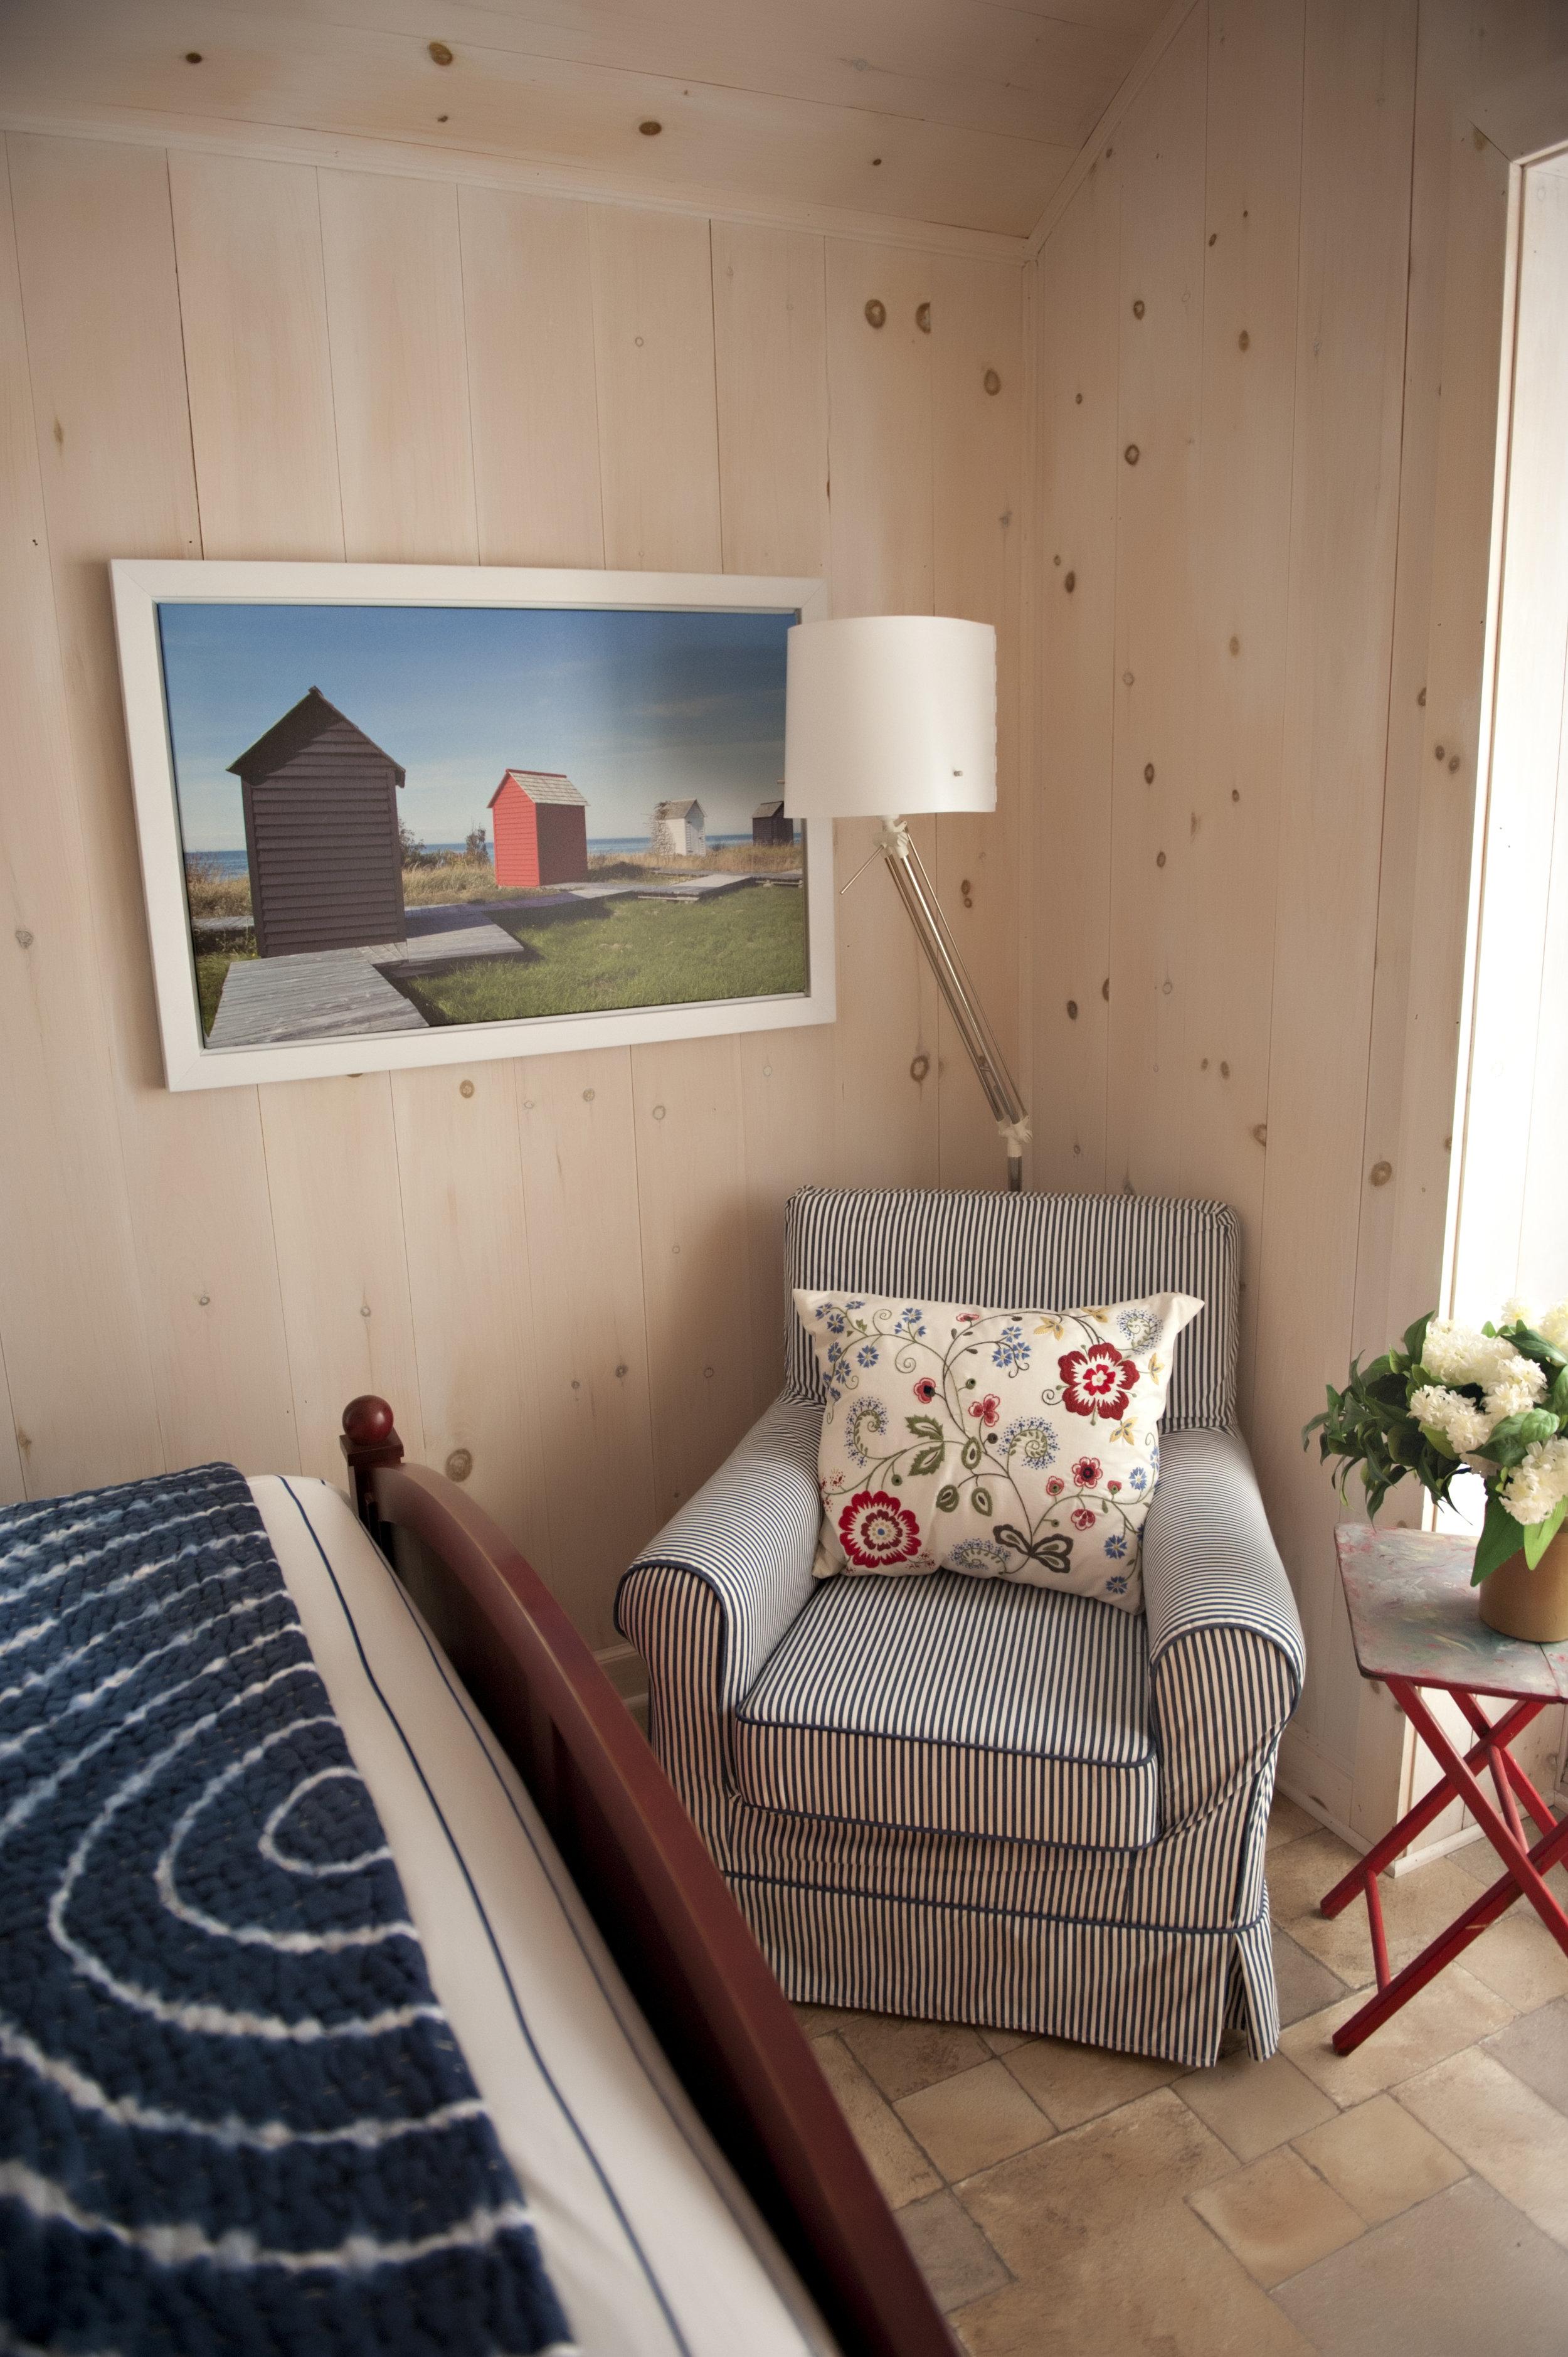 Candace-Plotz-Design-Beach-House-2-Bedroom